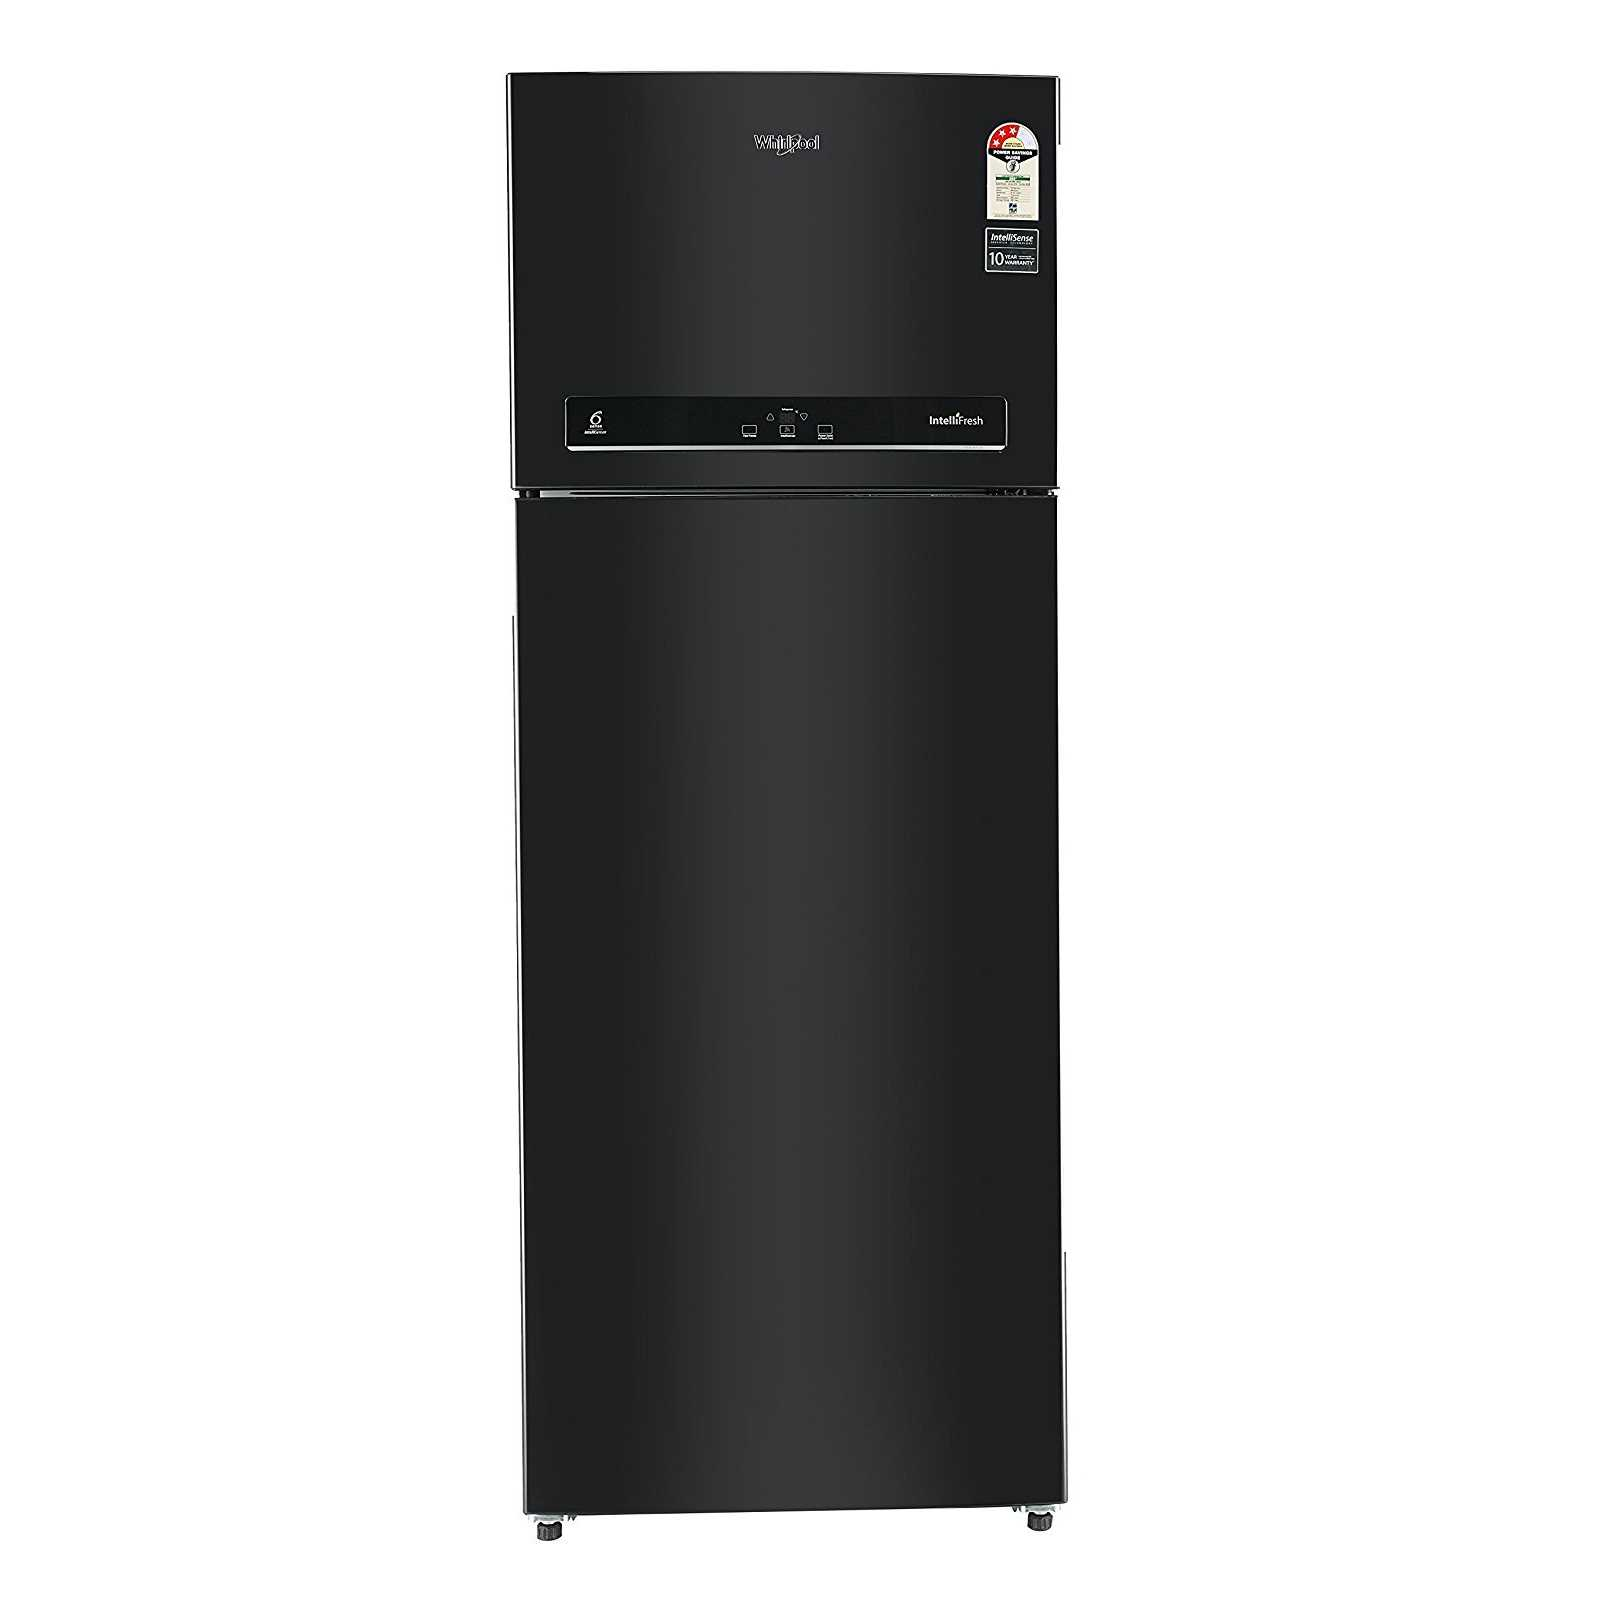 Whirlpool IF 515 500 Litres Frost Free Double Door Refrigerator